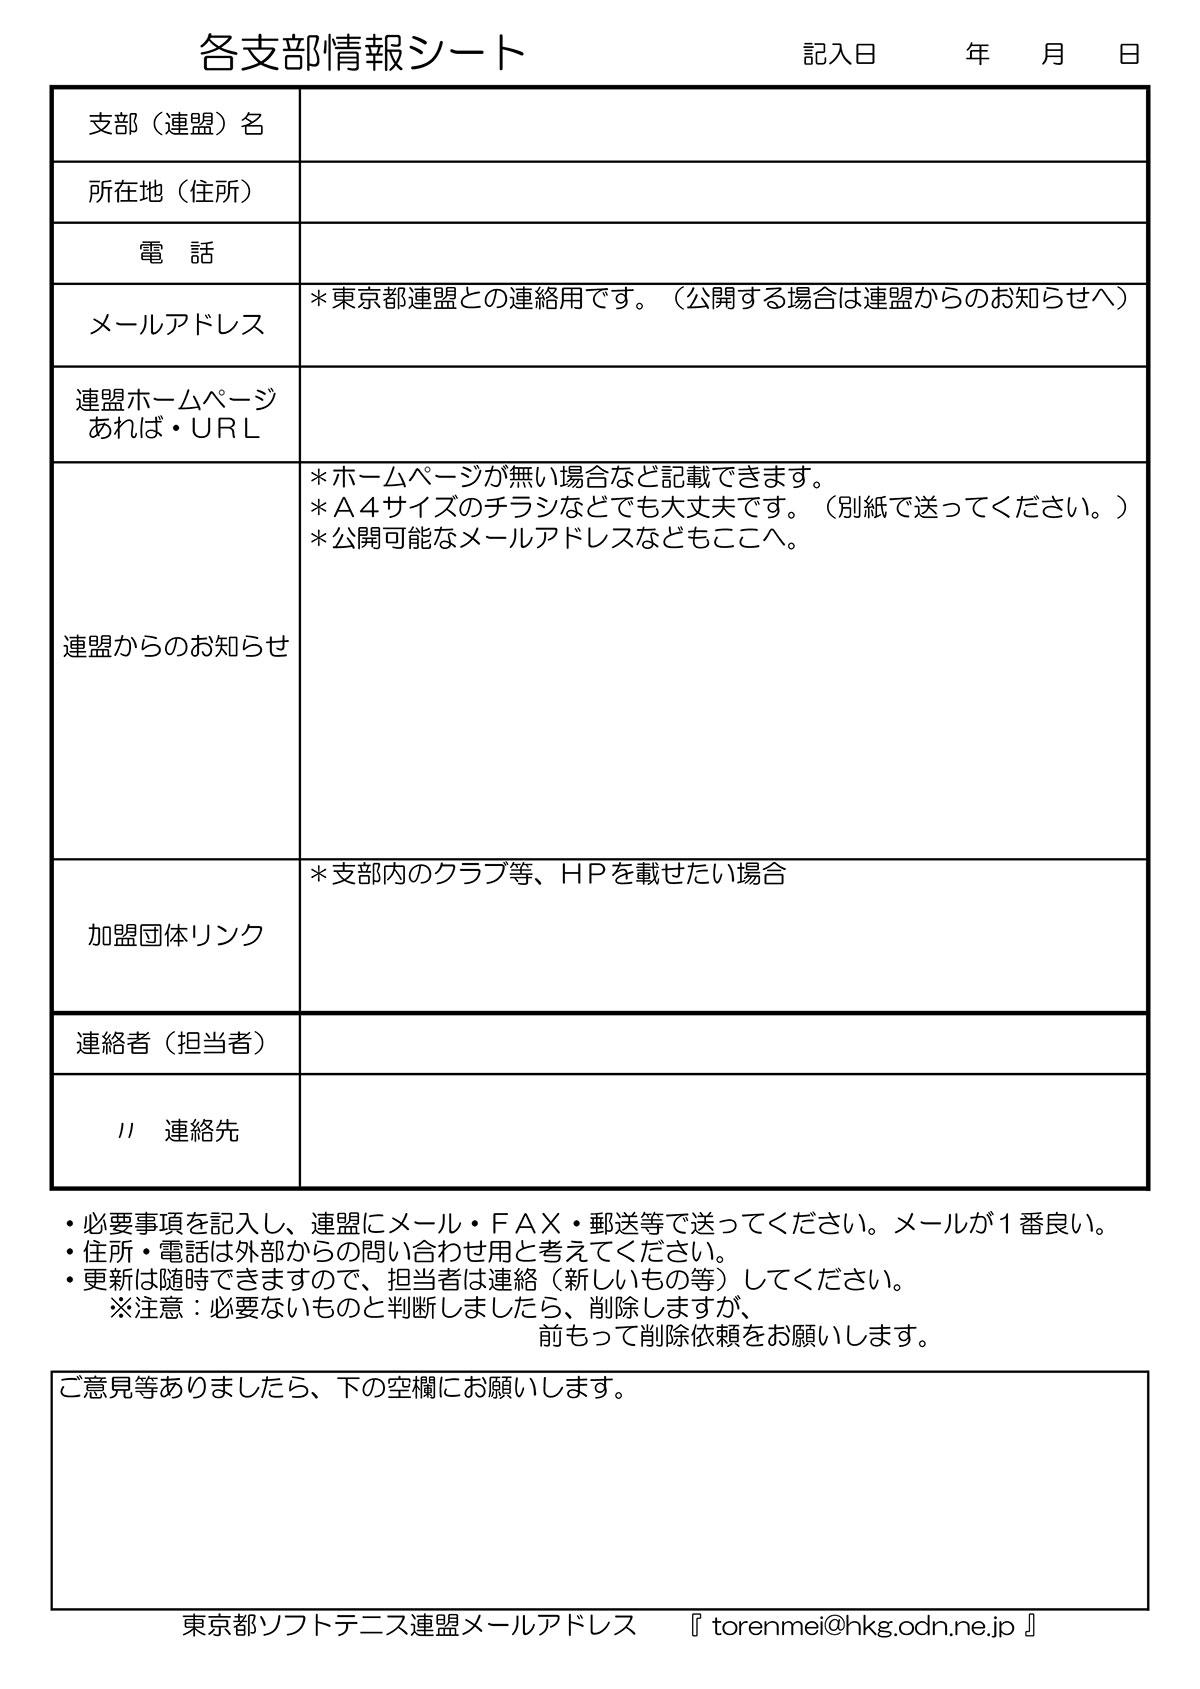 支部情報シート